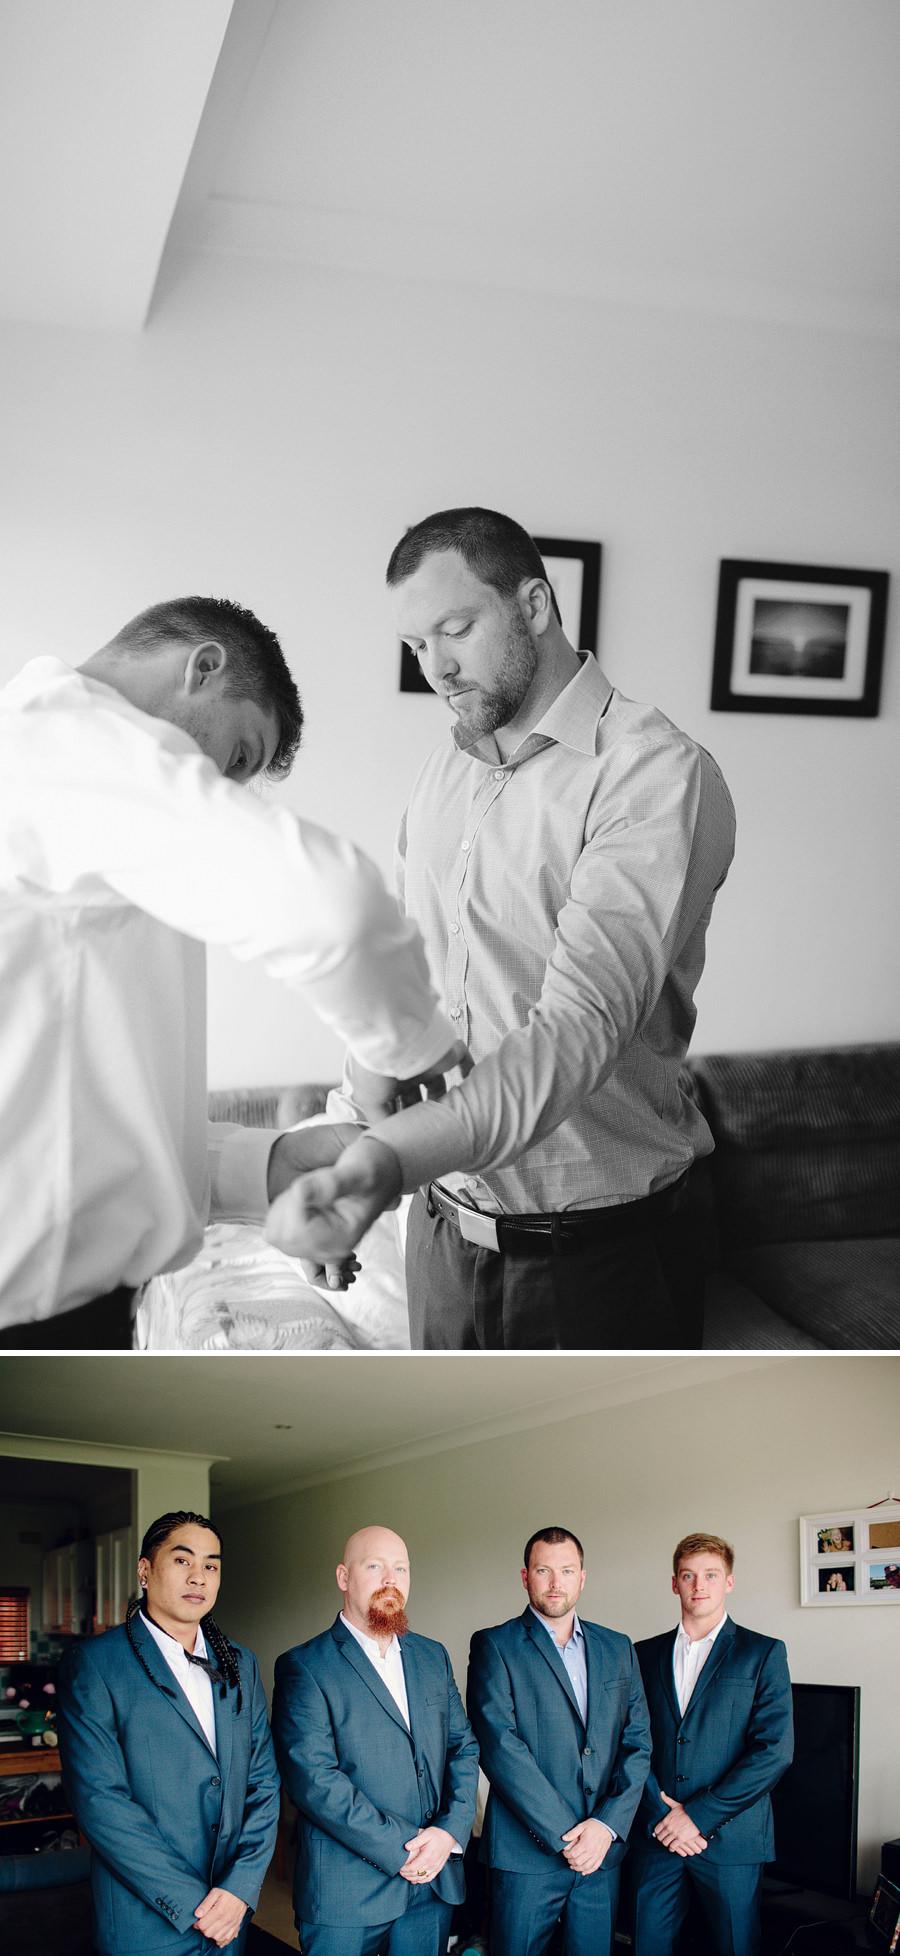 North Manly Wedding Photography: Boys getting ready